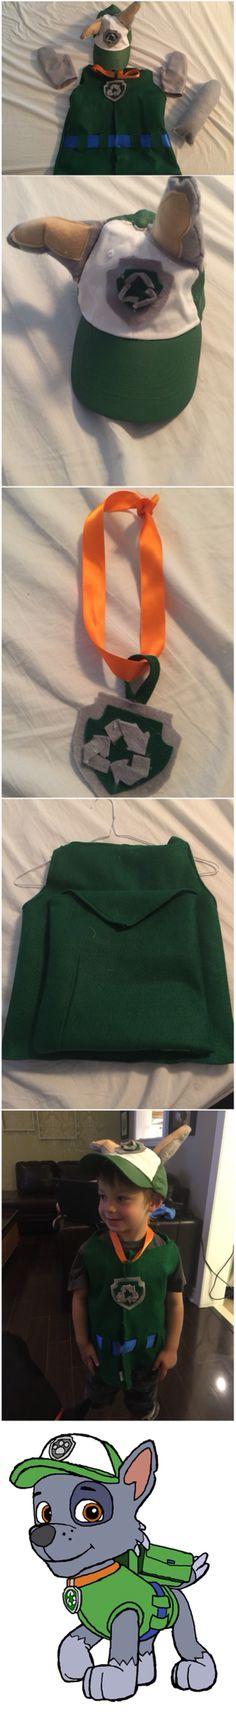 Paw Patrol Rocky Costume  Materials: Green felt, grey felt, tan felt, blue 3 inch ribbon, orange 1 inch ribbon , sewing machine, hot glue gun, Velcro tape, white hate, green paint, paintbrush.